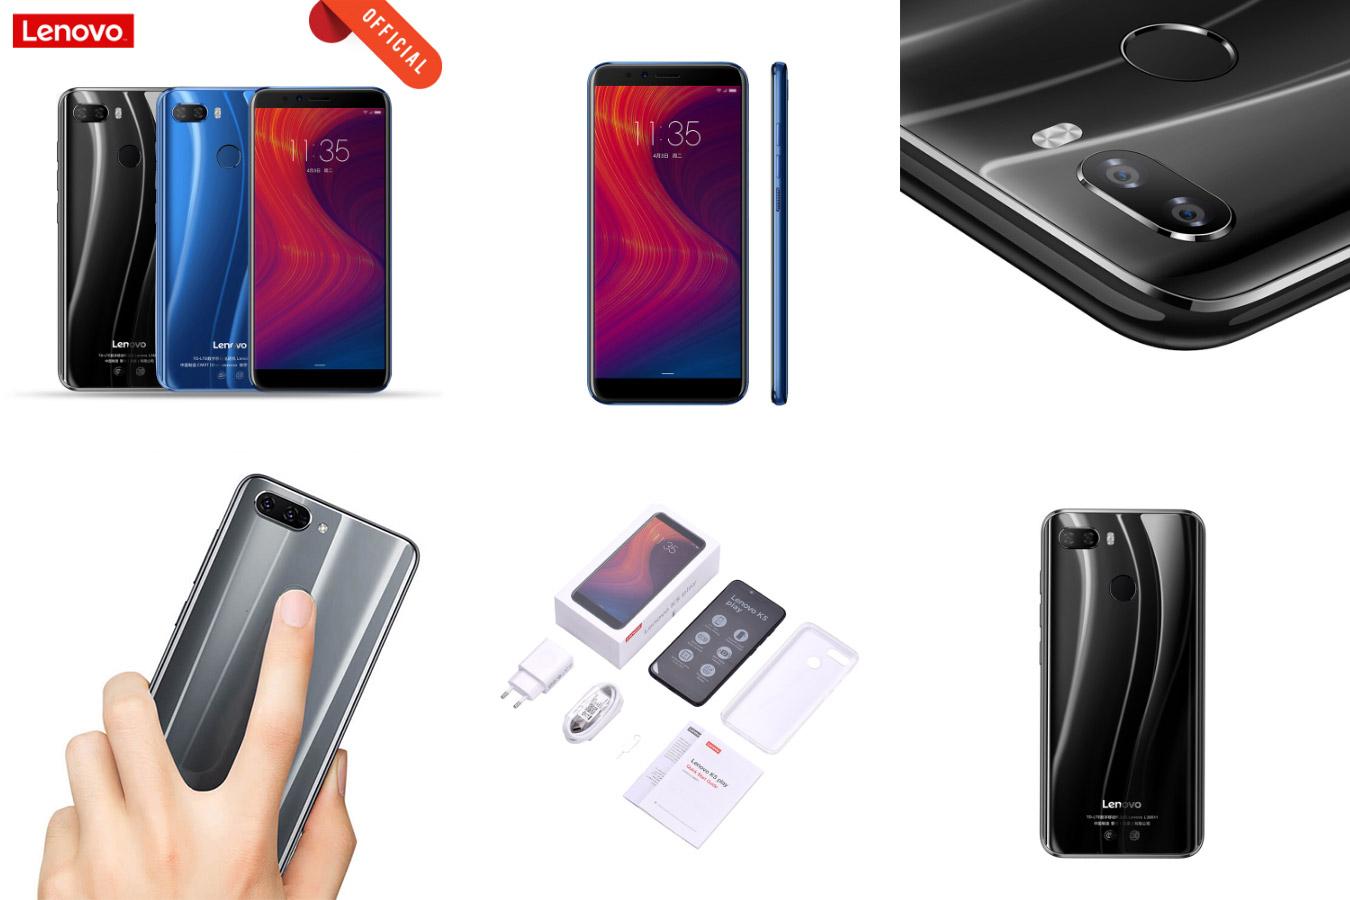 Доступный смартфон Lenovo K5 Play